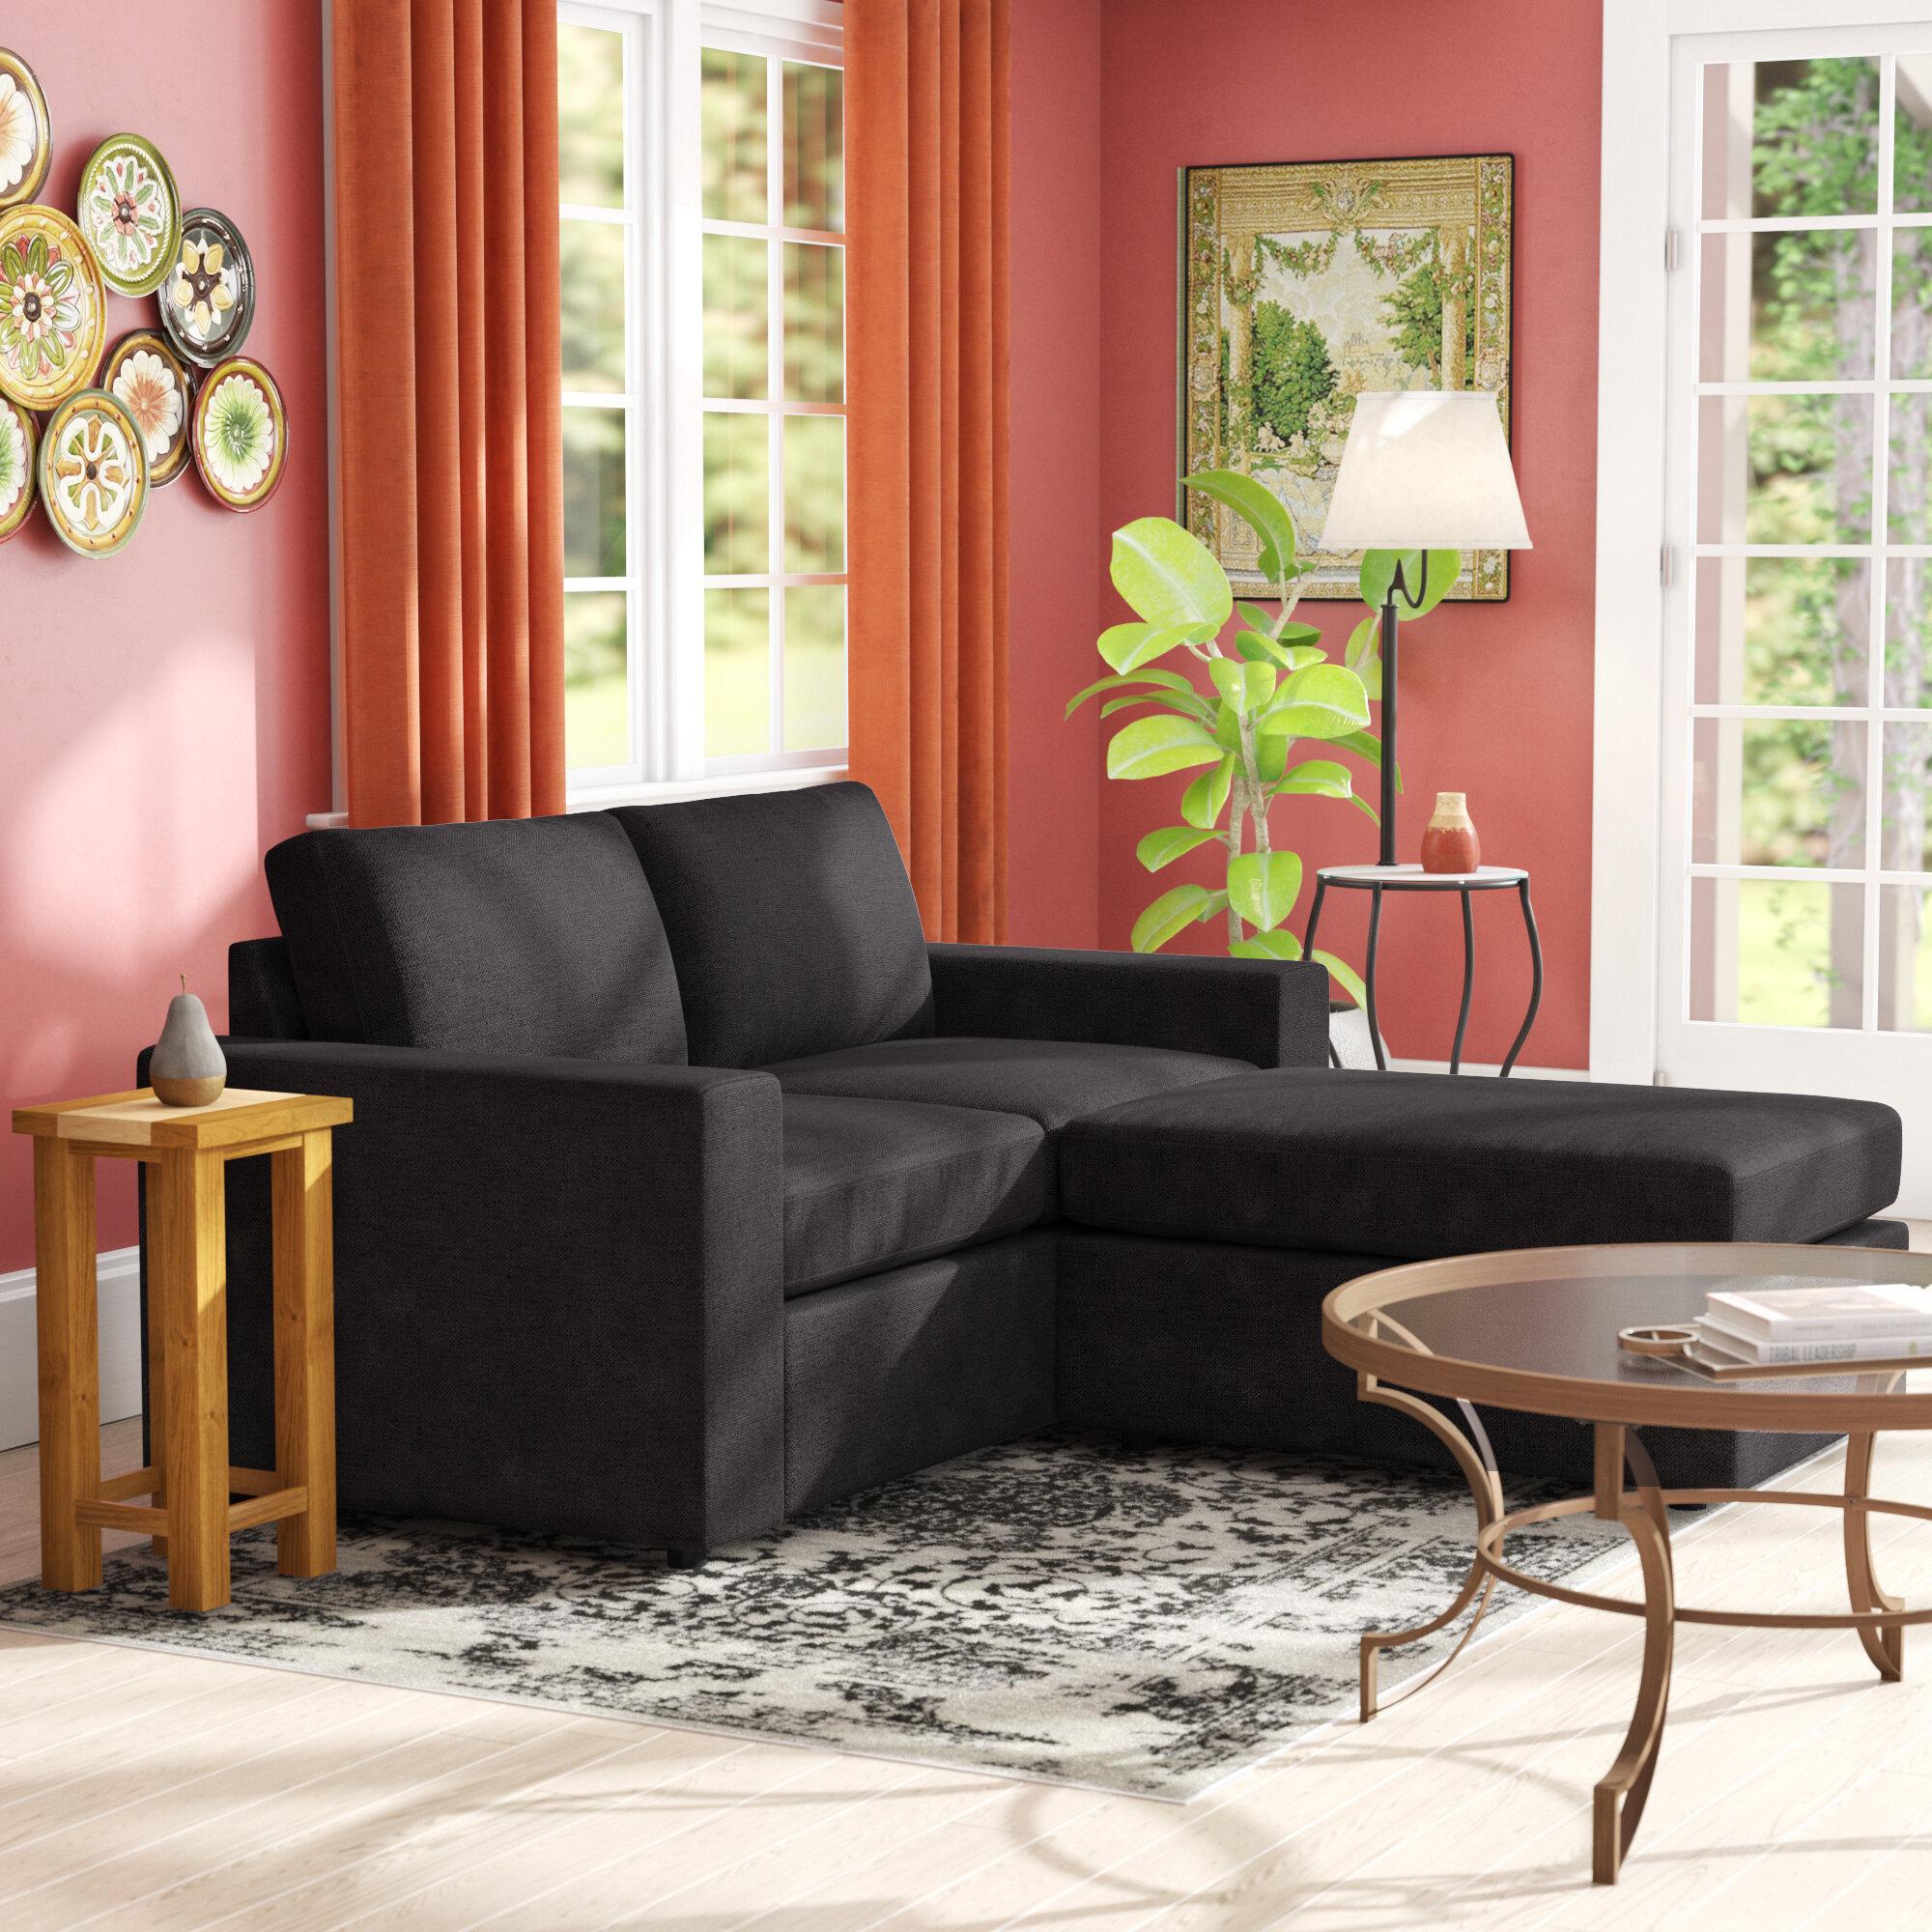 Enjoyable Gosnell Mini Modular Sectional Creativecarmelina Interior Chair Design Creativecarmelinacom